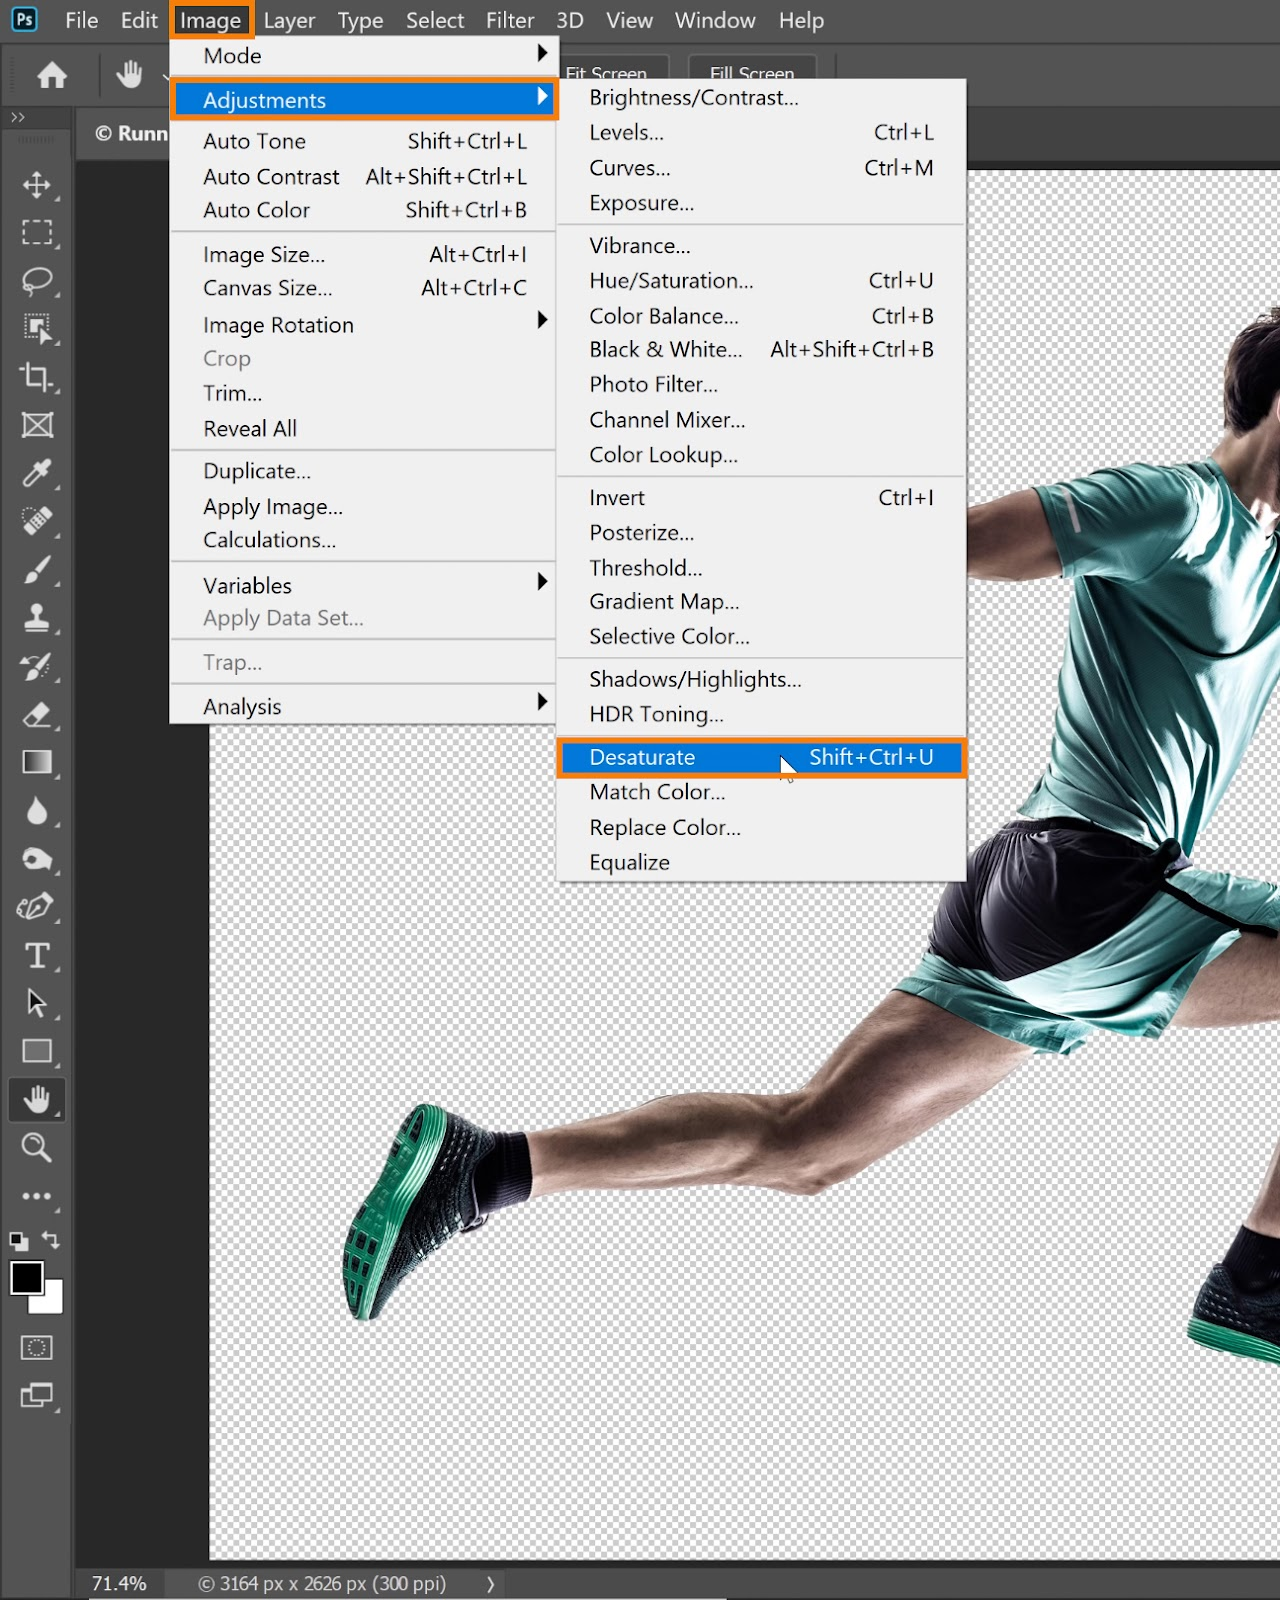 Choose Image > Adjustments  > Desaturate